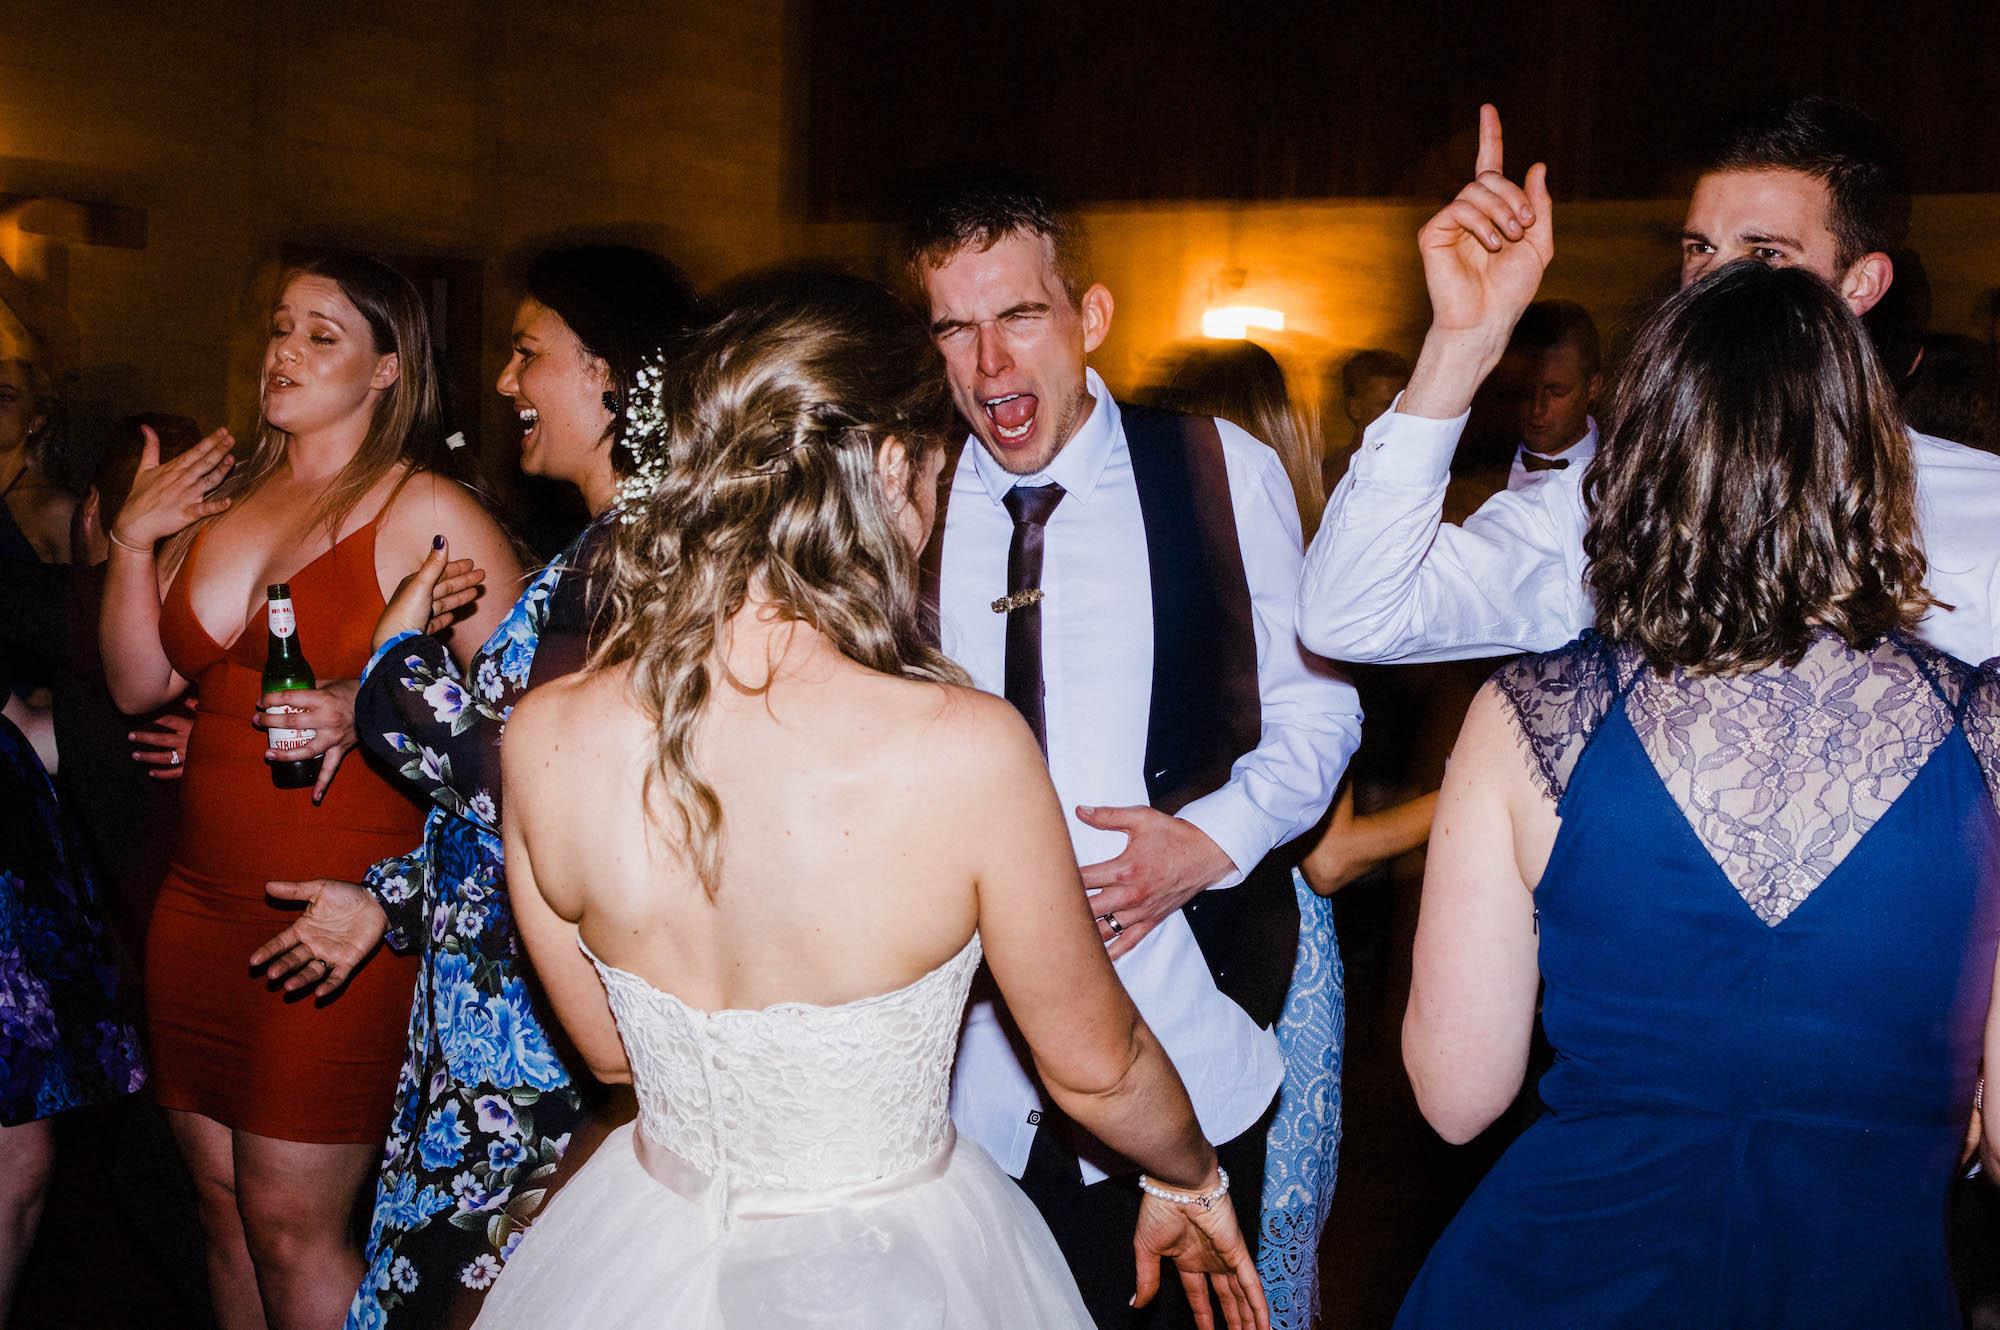 The bride & the groom dance at their Quarry Farm wedding reception